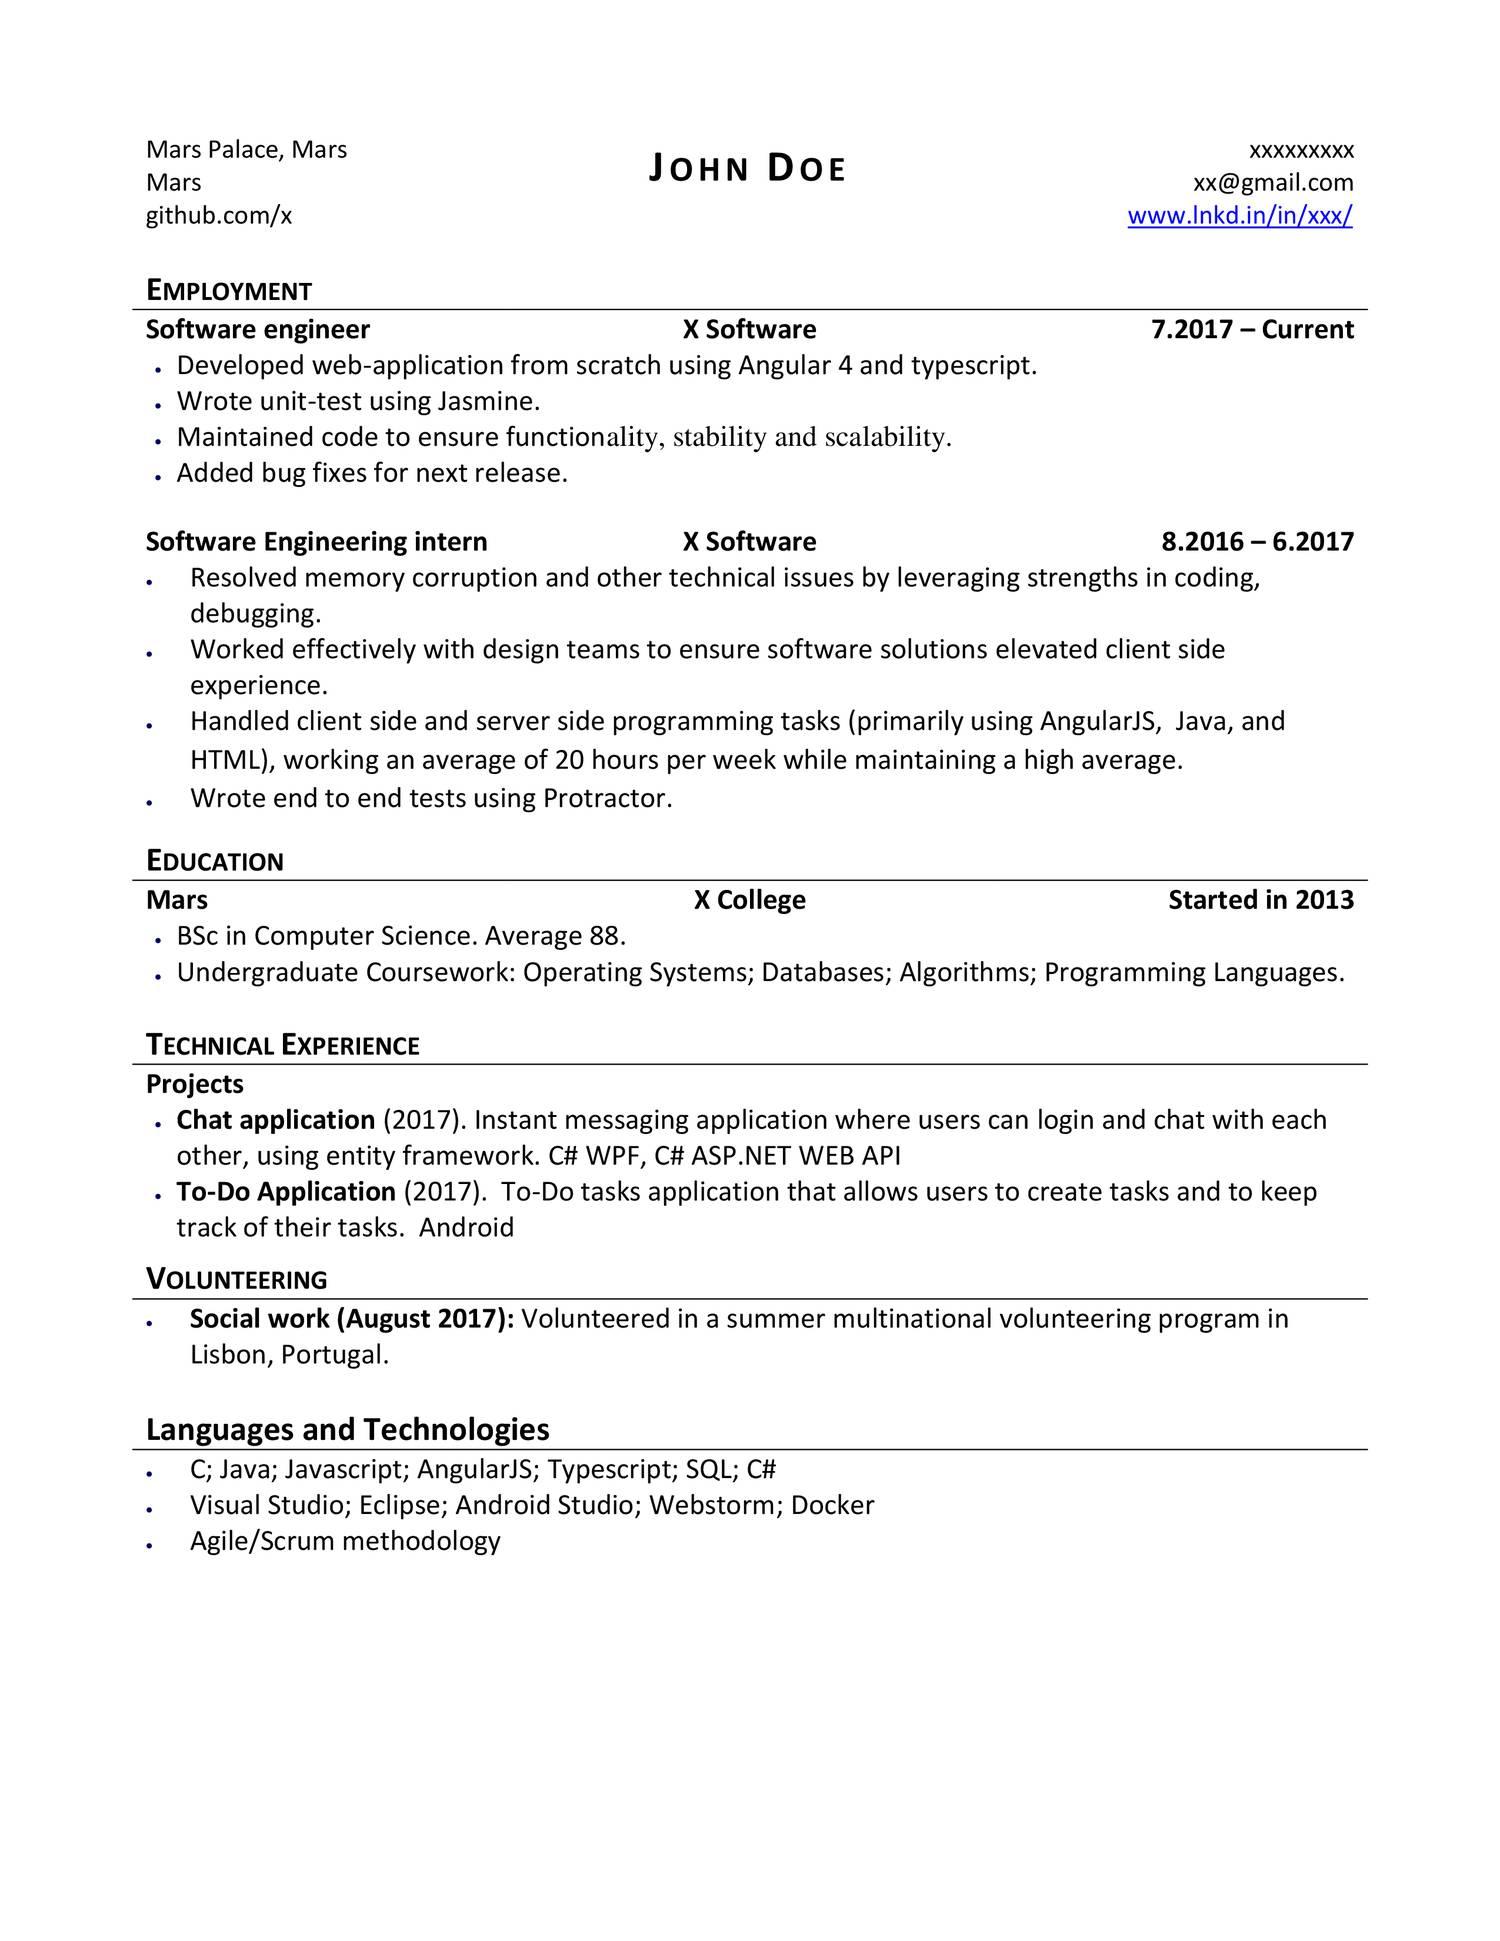 CV- John Doe - New pdf | DocDroid